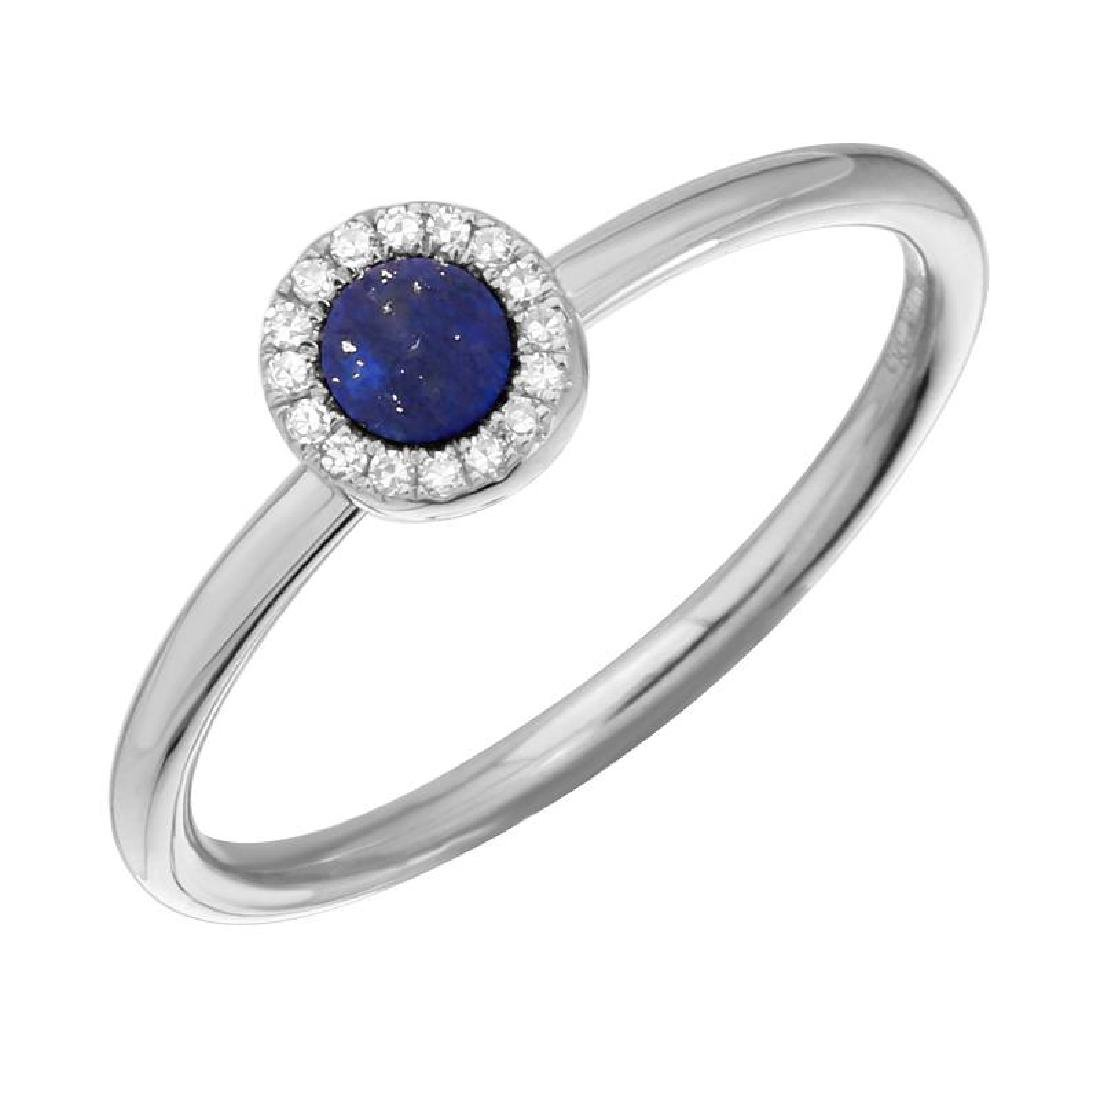 14KT White Gold Gemstone Ring